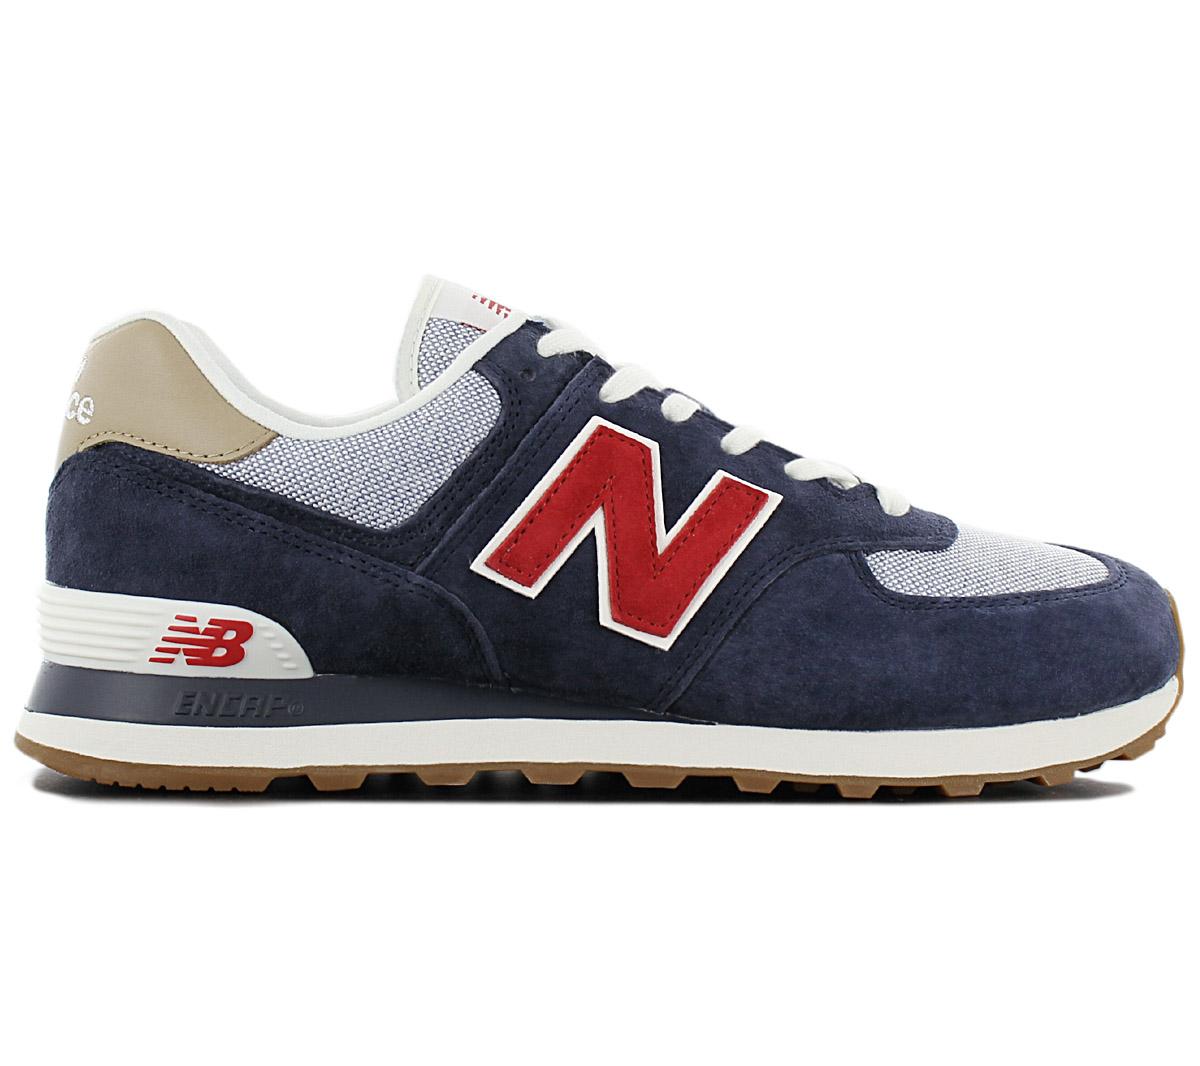 Sale Uomo 574 Sneaker Ml574ptr Scarpe New Balance Nuovo Classics qxTfTS